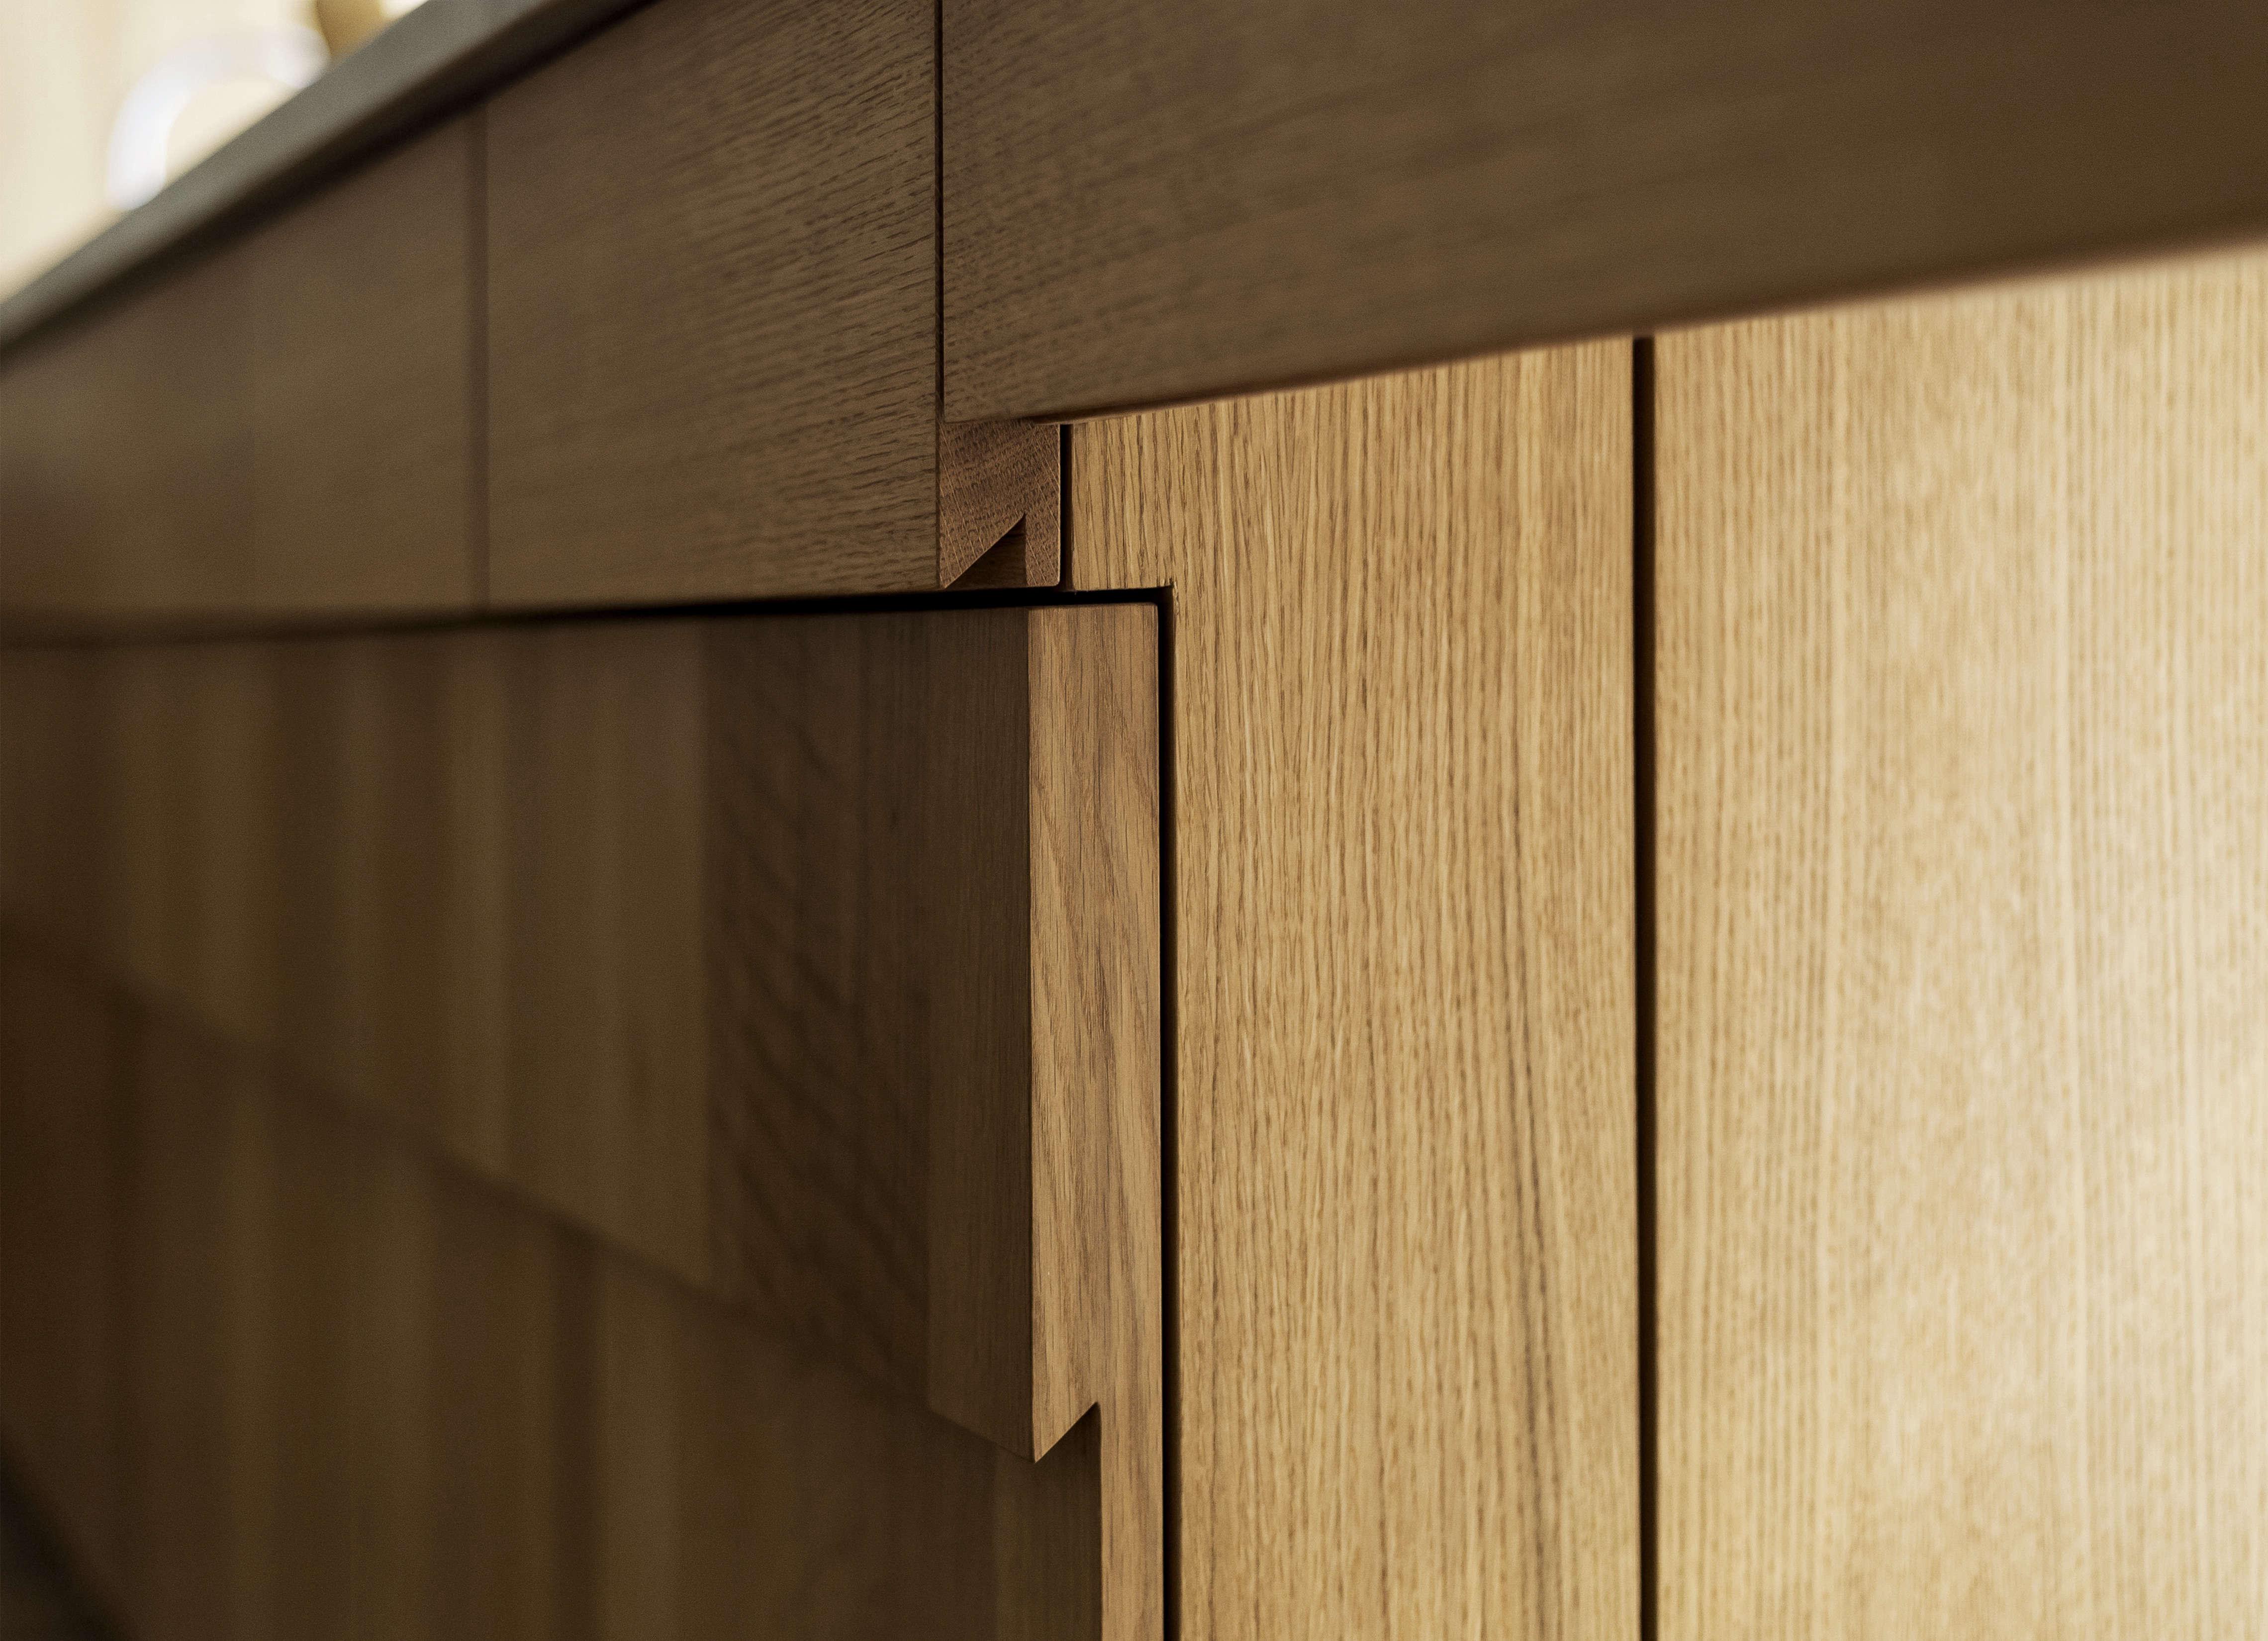 Custom stepped oak kitchen cabinets detail, designed by Workstead, Matthew Williams photo